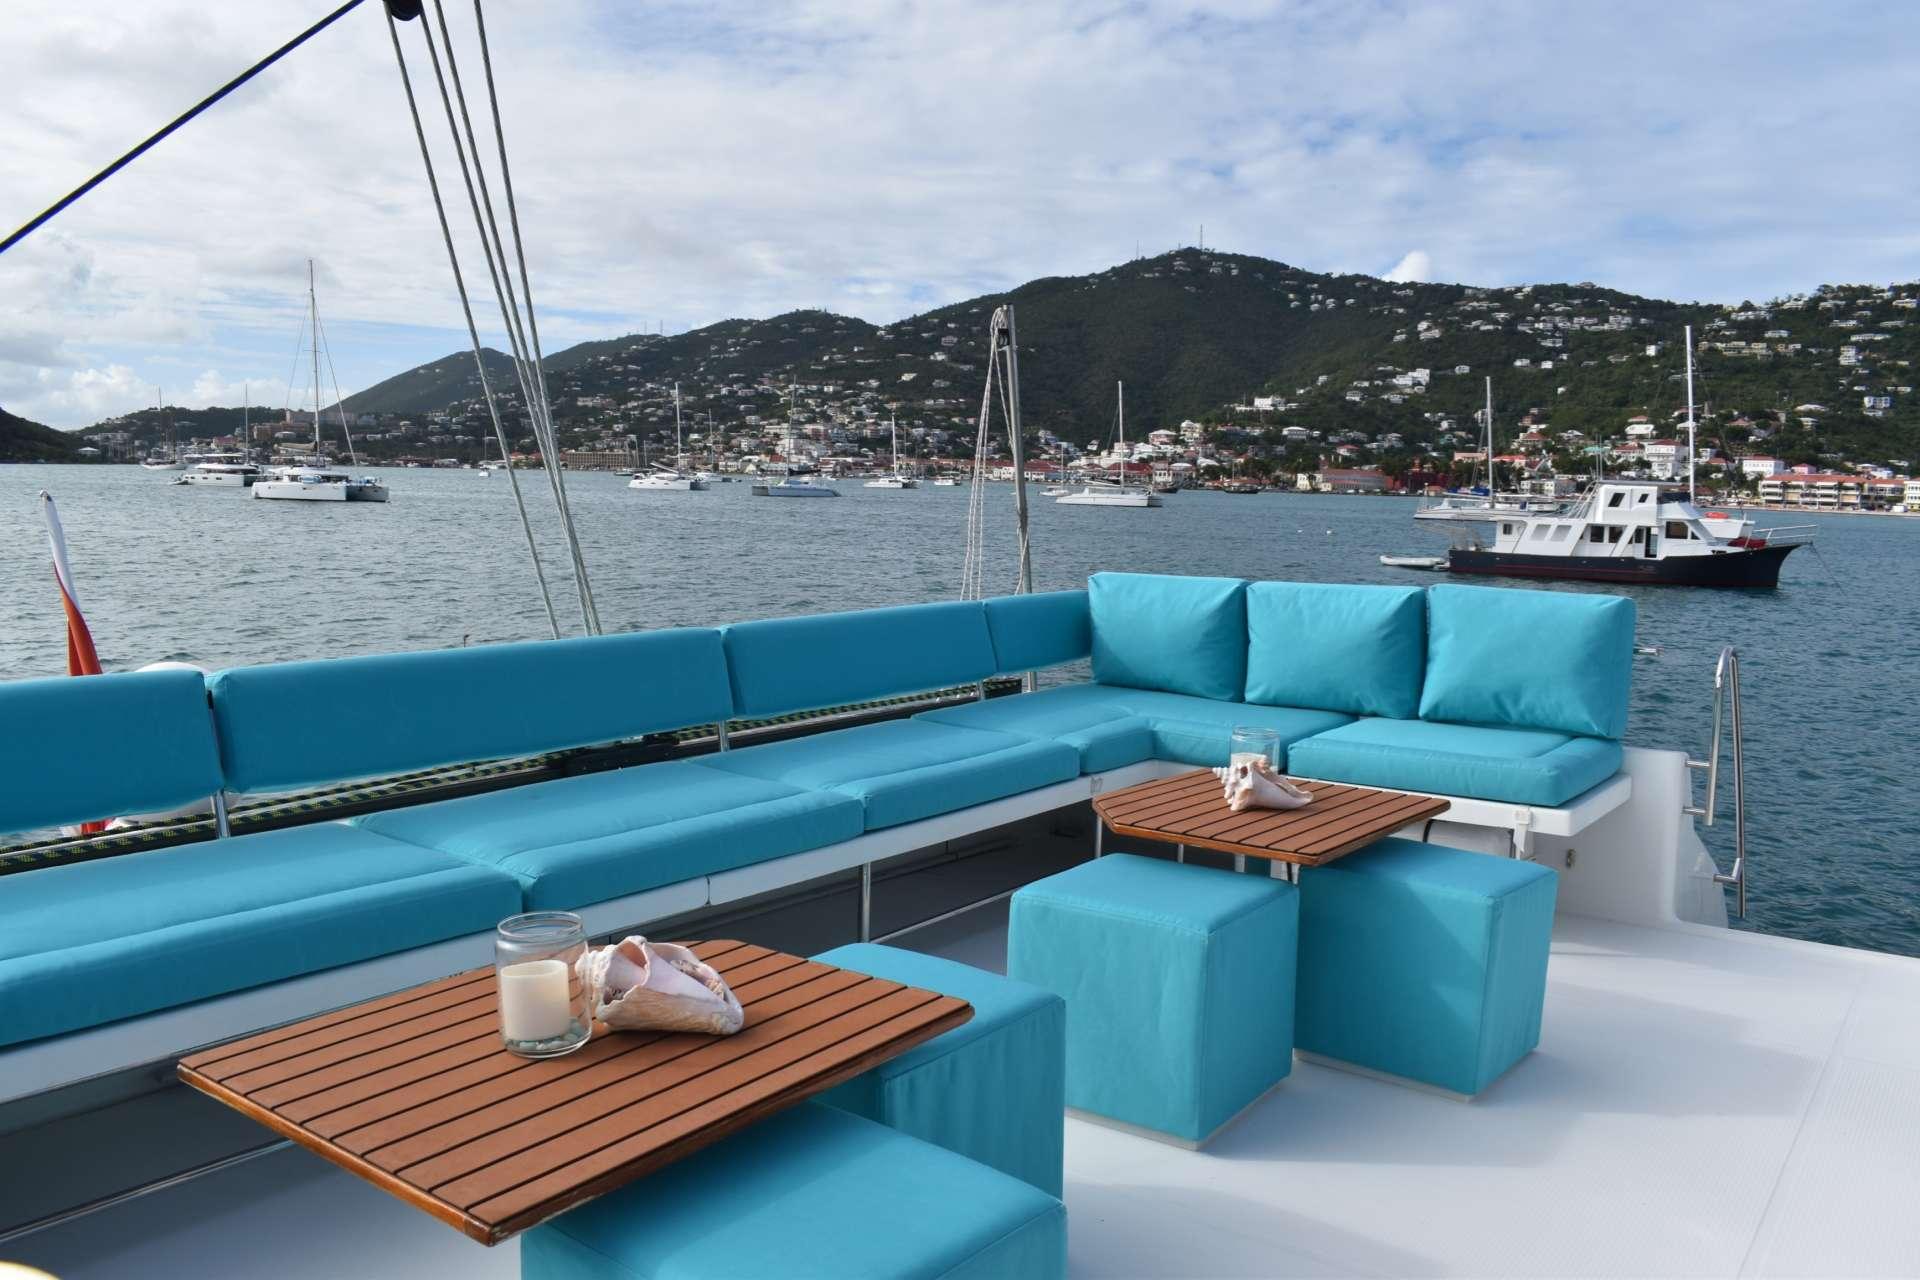 Image of LIR yacht #13